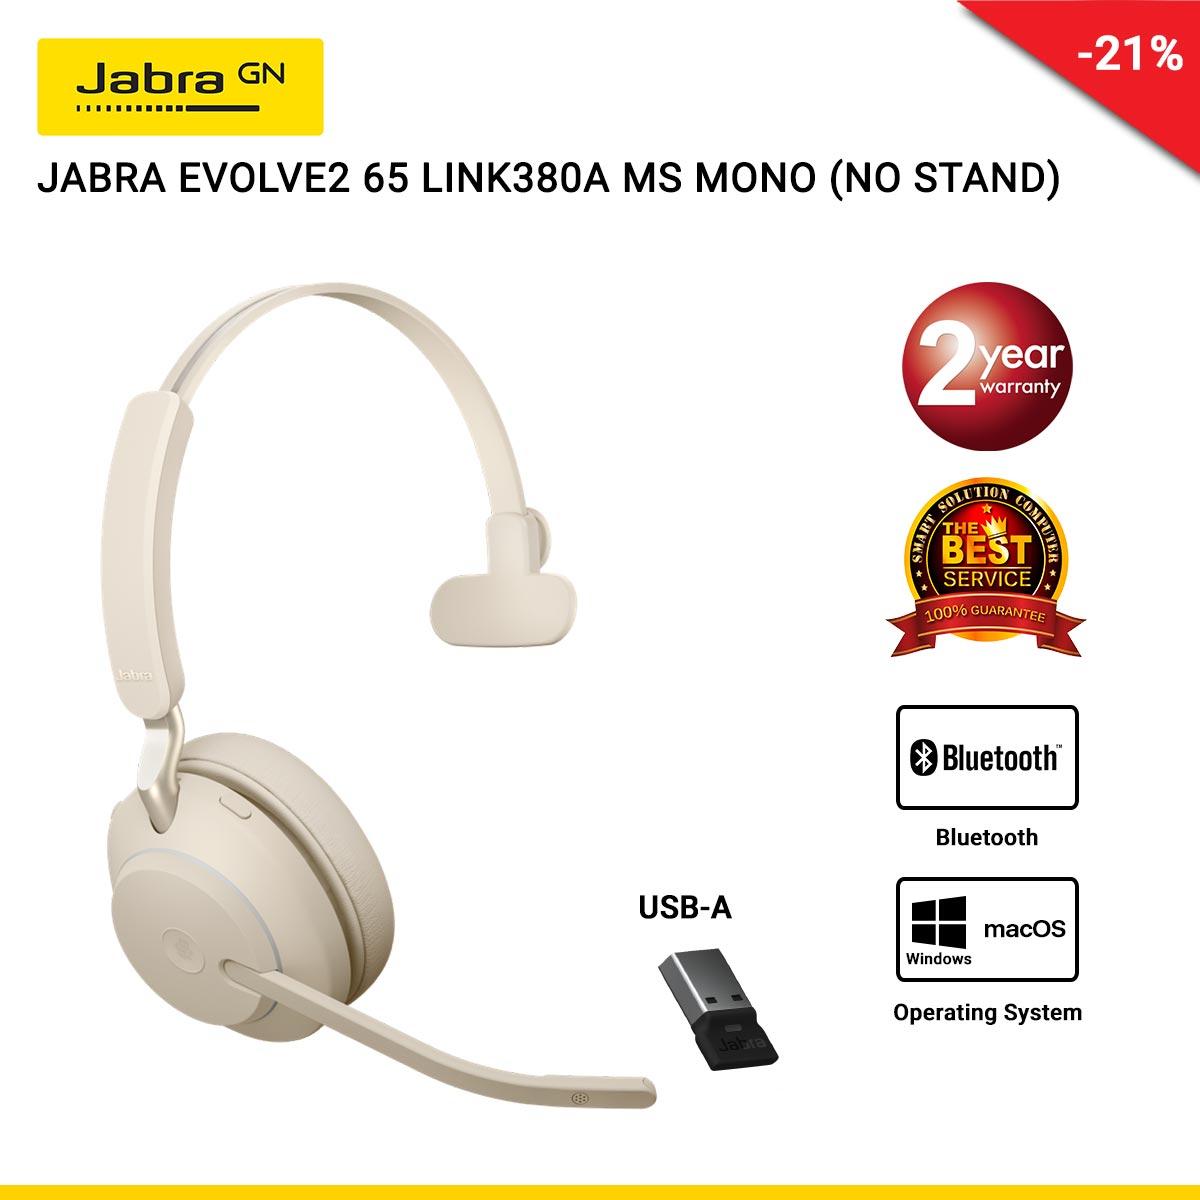 JABRA EVOLVE2 65 LINK380A MS MONO BEIGE (JBA-26599-899-998)